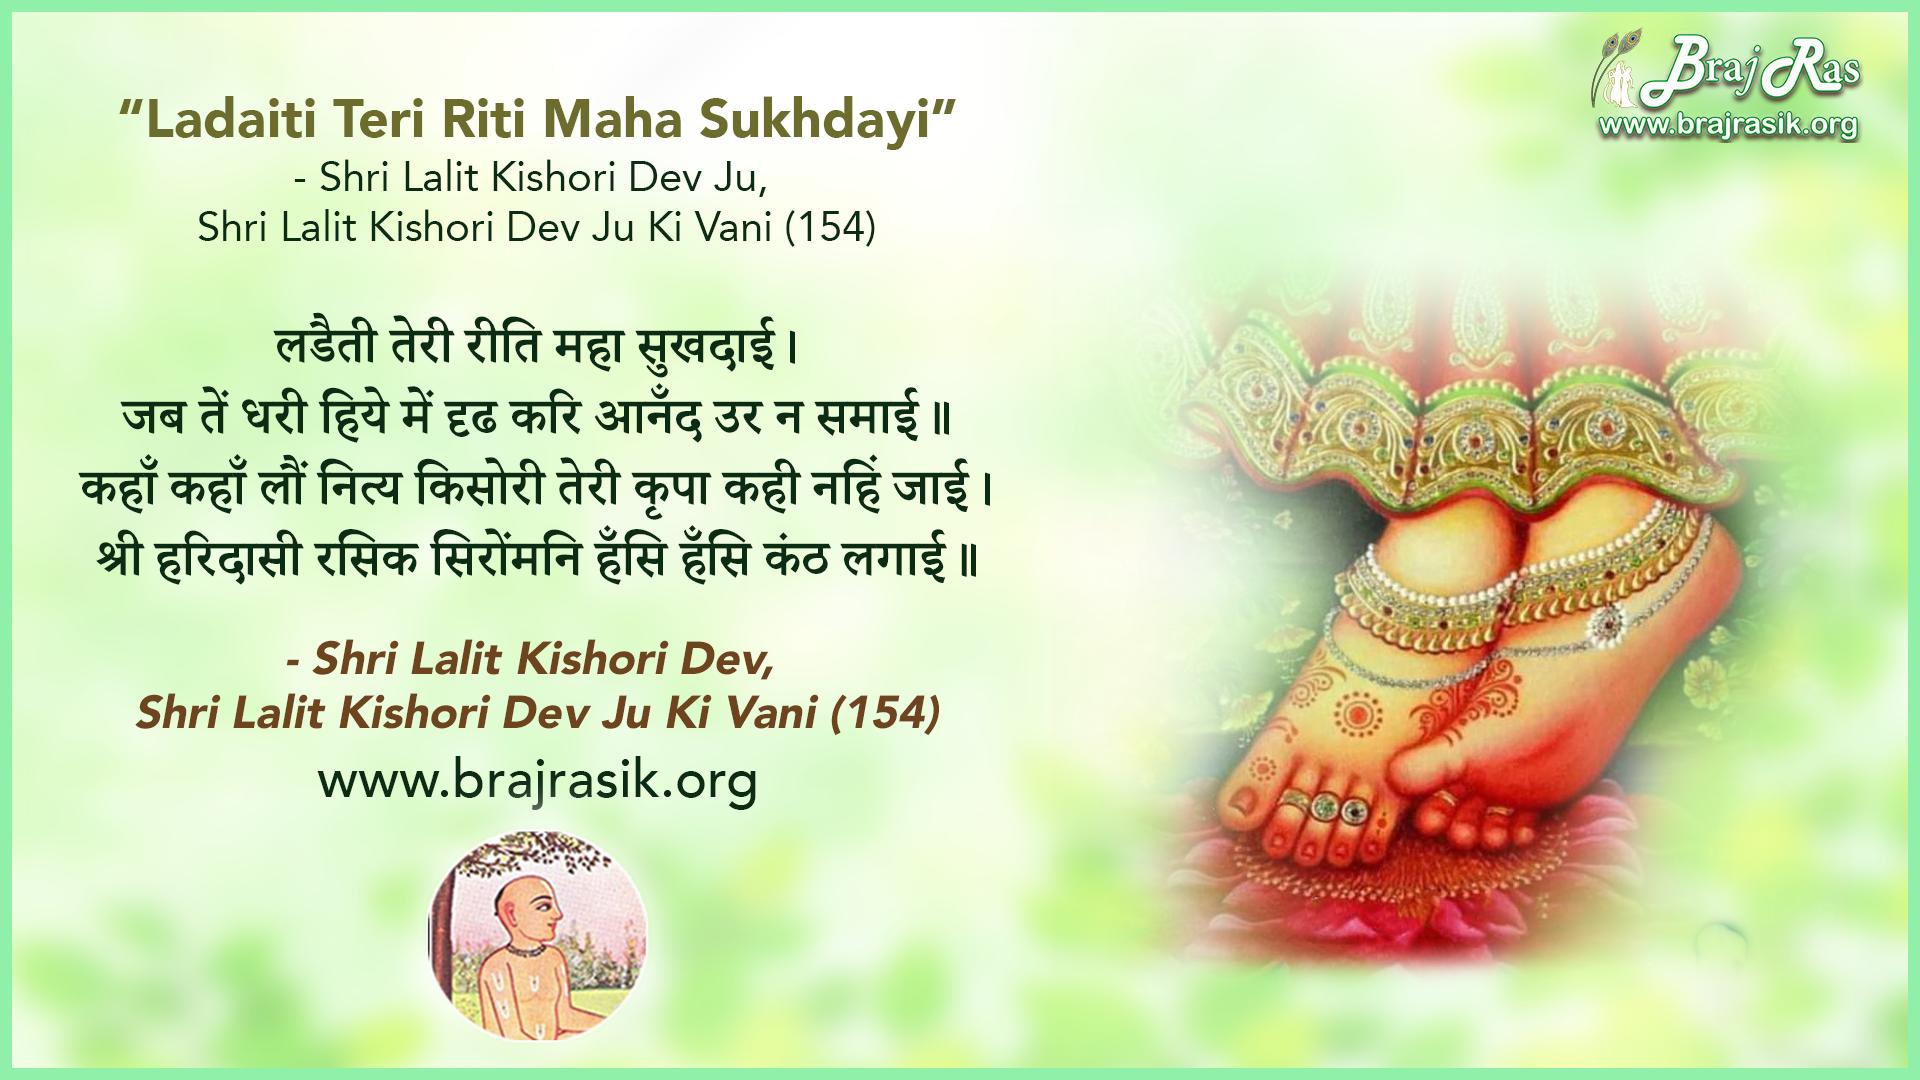 Ladaiti Teri Reeti Maha Sukhdayi - Shri Lalit Kishori Dev, Shri Lalit Kishori Dev Ju Ki Vani (154)